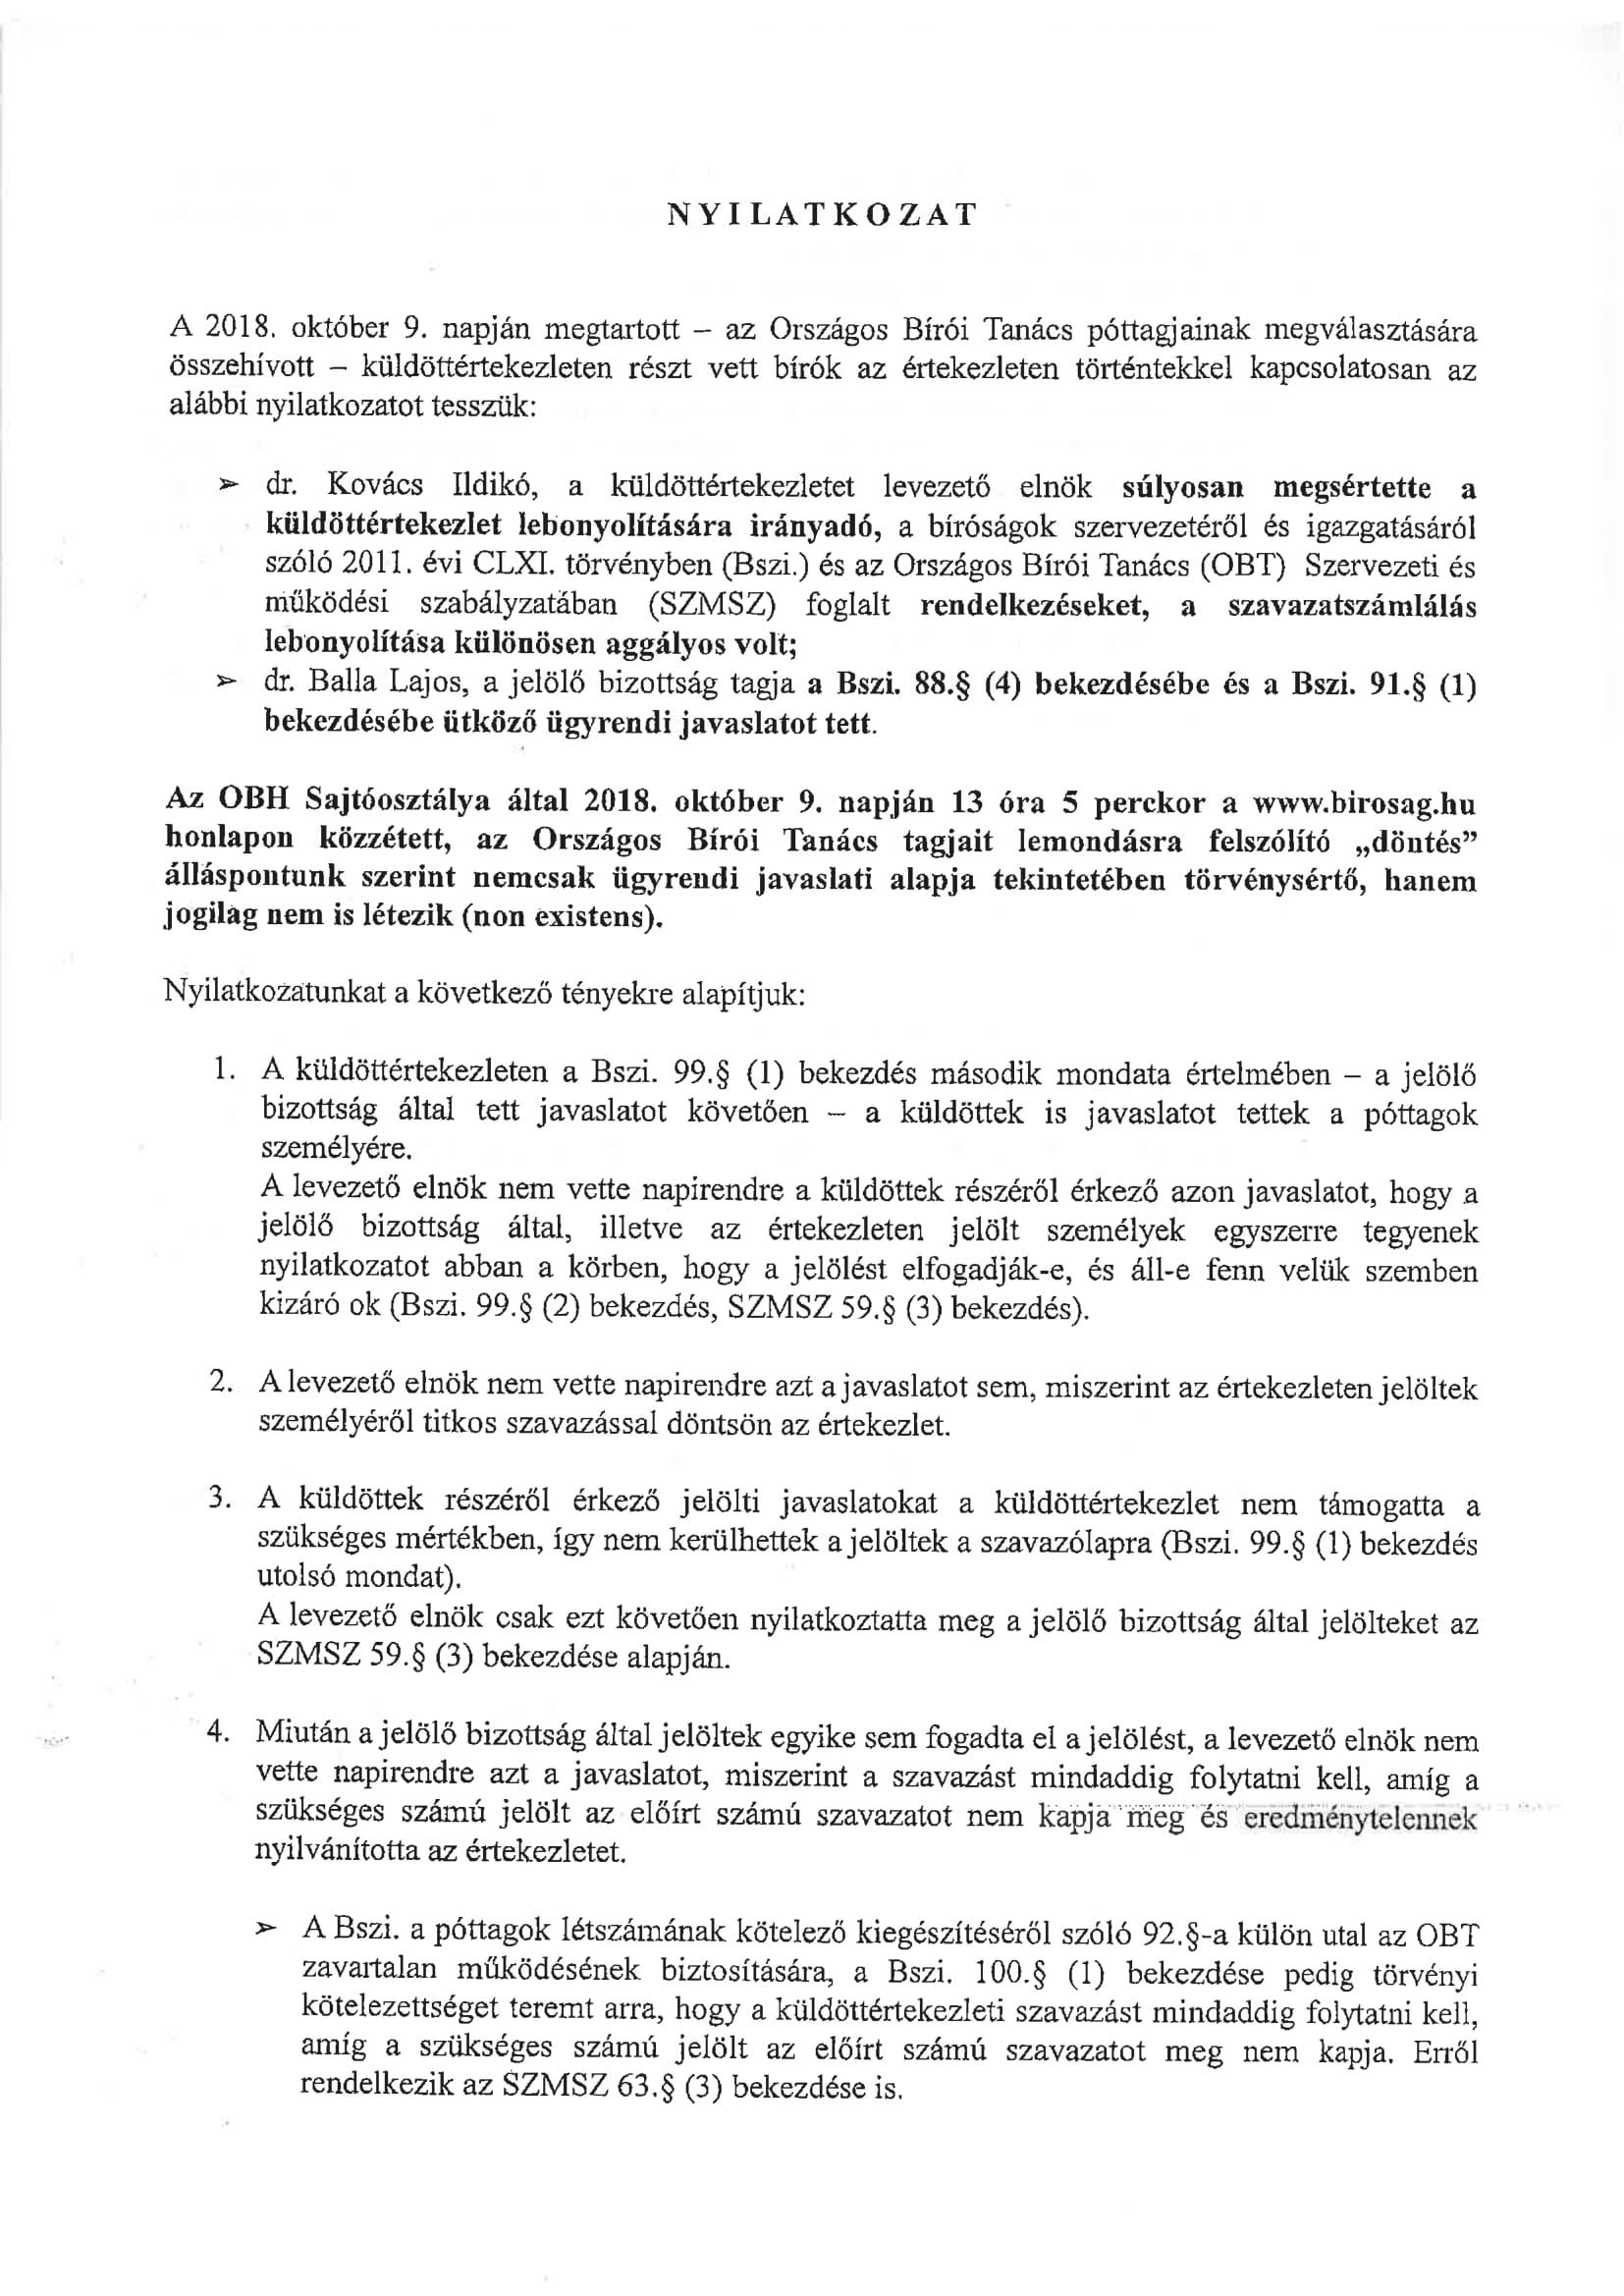 biroi_tanacs_nyilatkozata-1.jpg